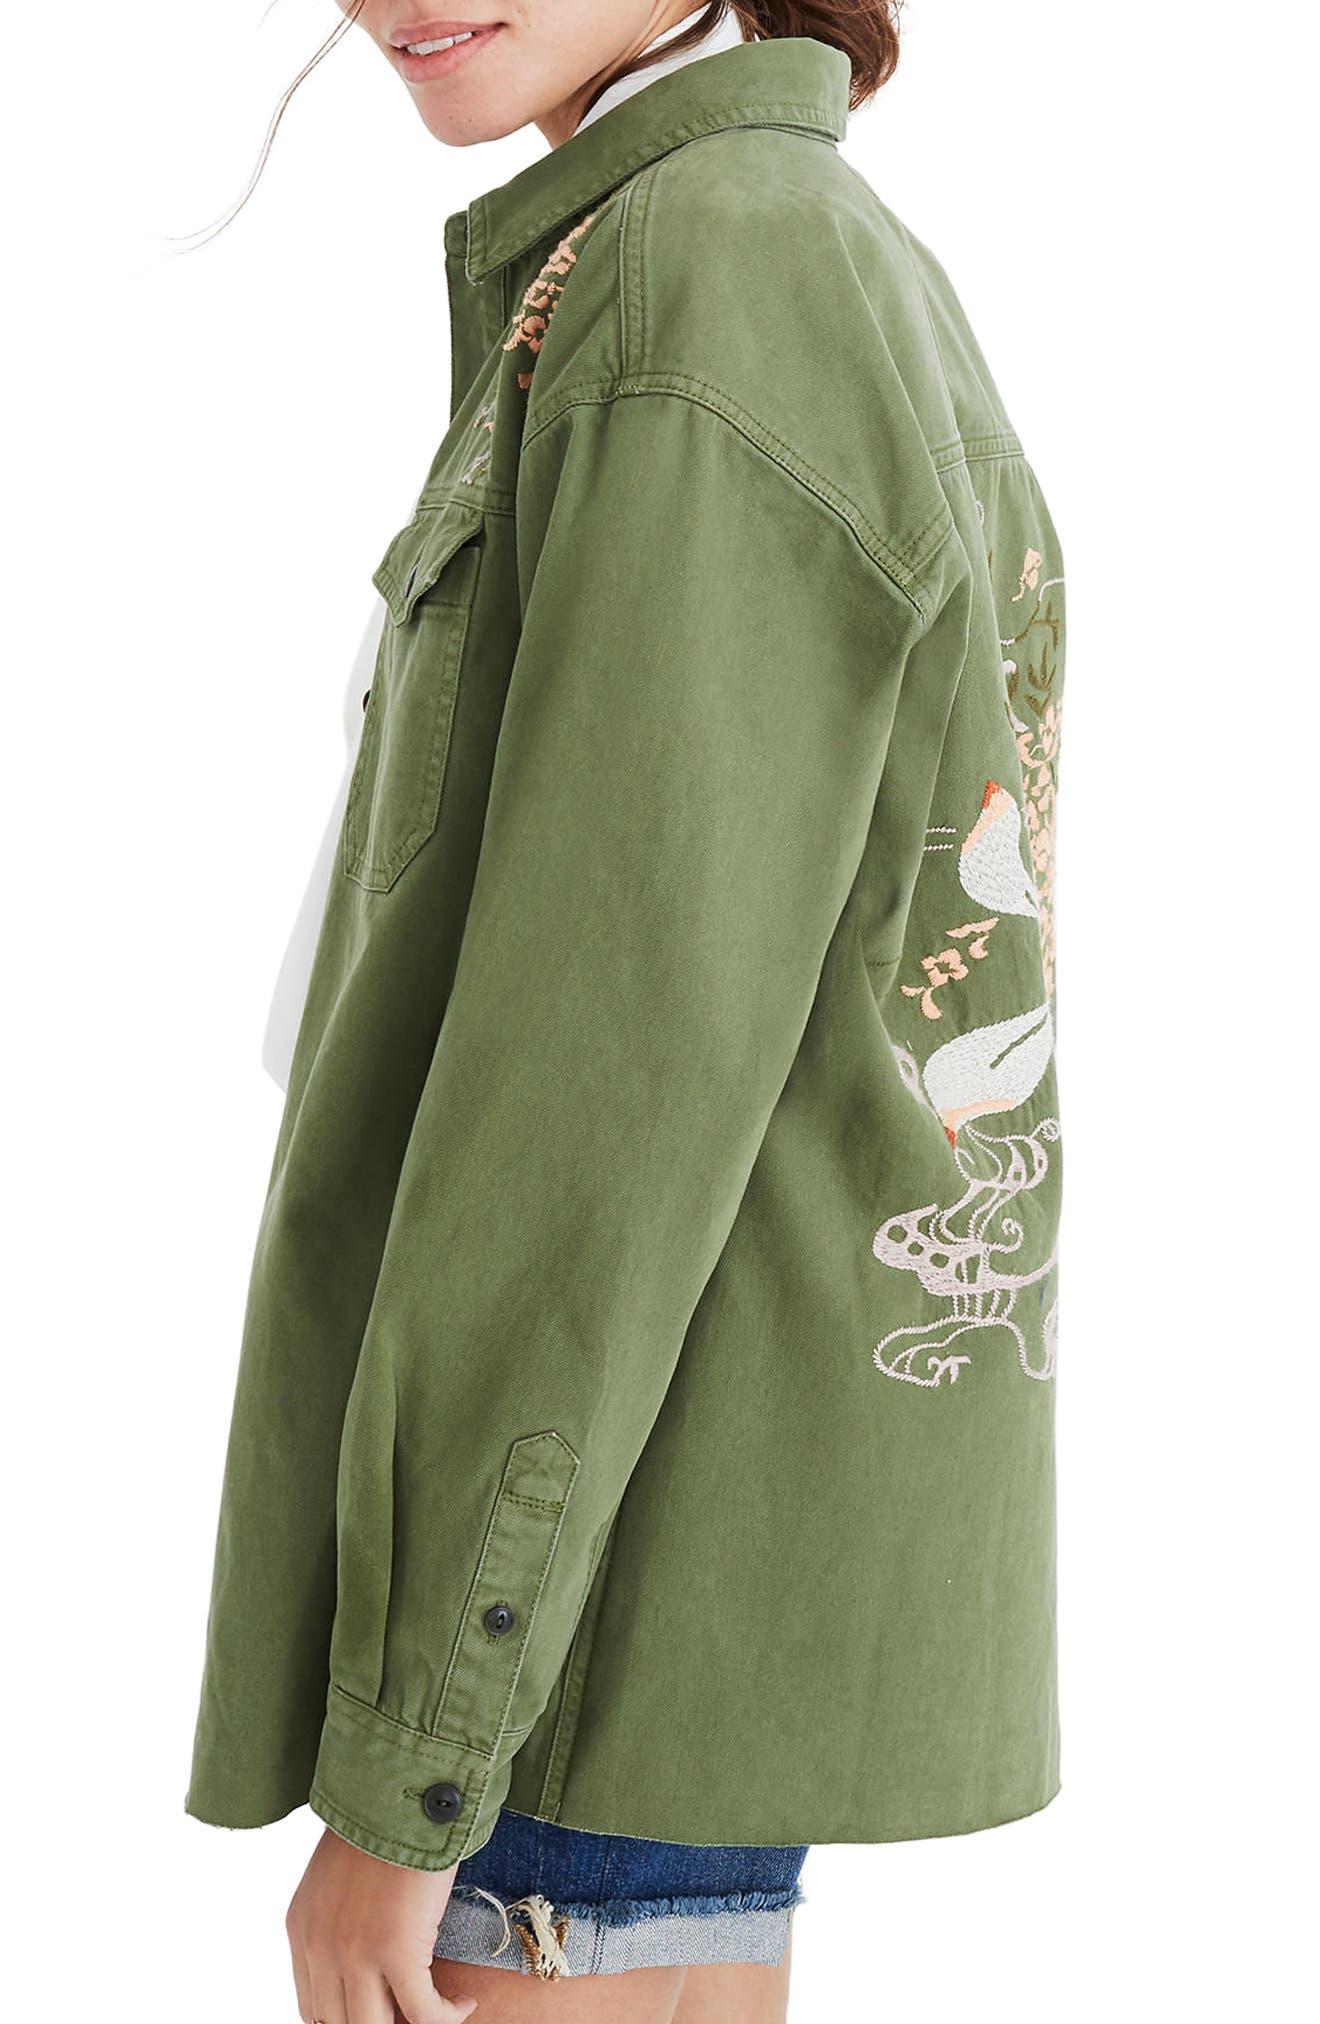 Rabbit Embroidered Shirt Jacket,                             Alternate thumbnail 3, color,                             300